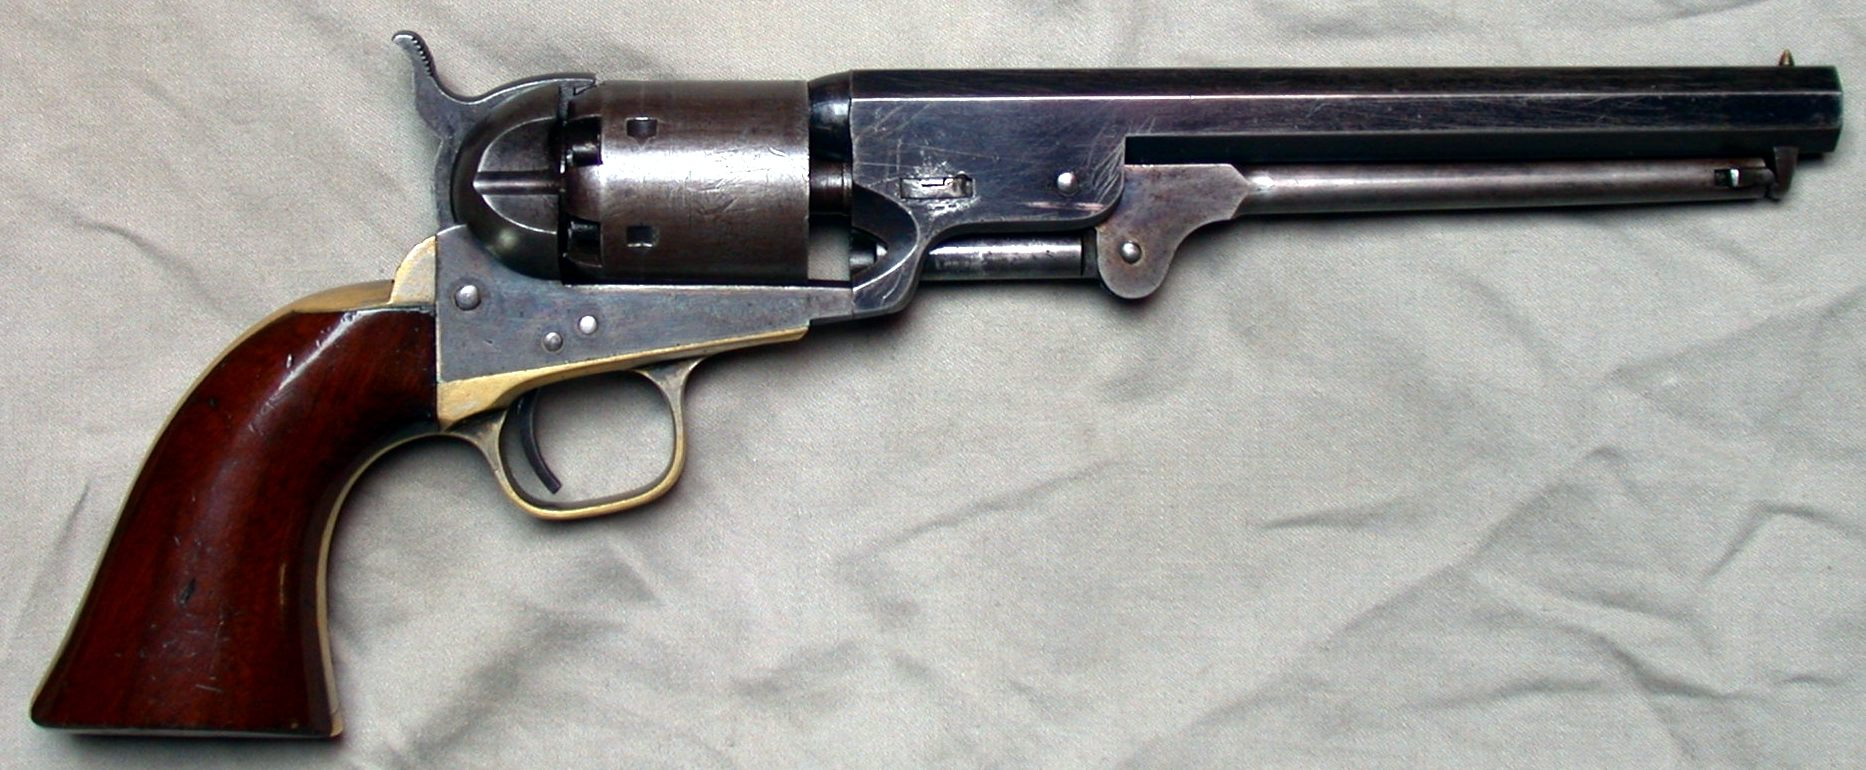 colt 1851 navy revolver wikipedia